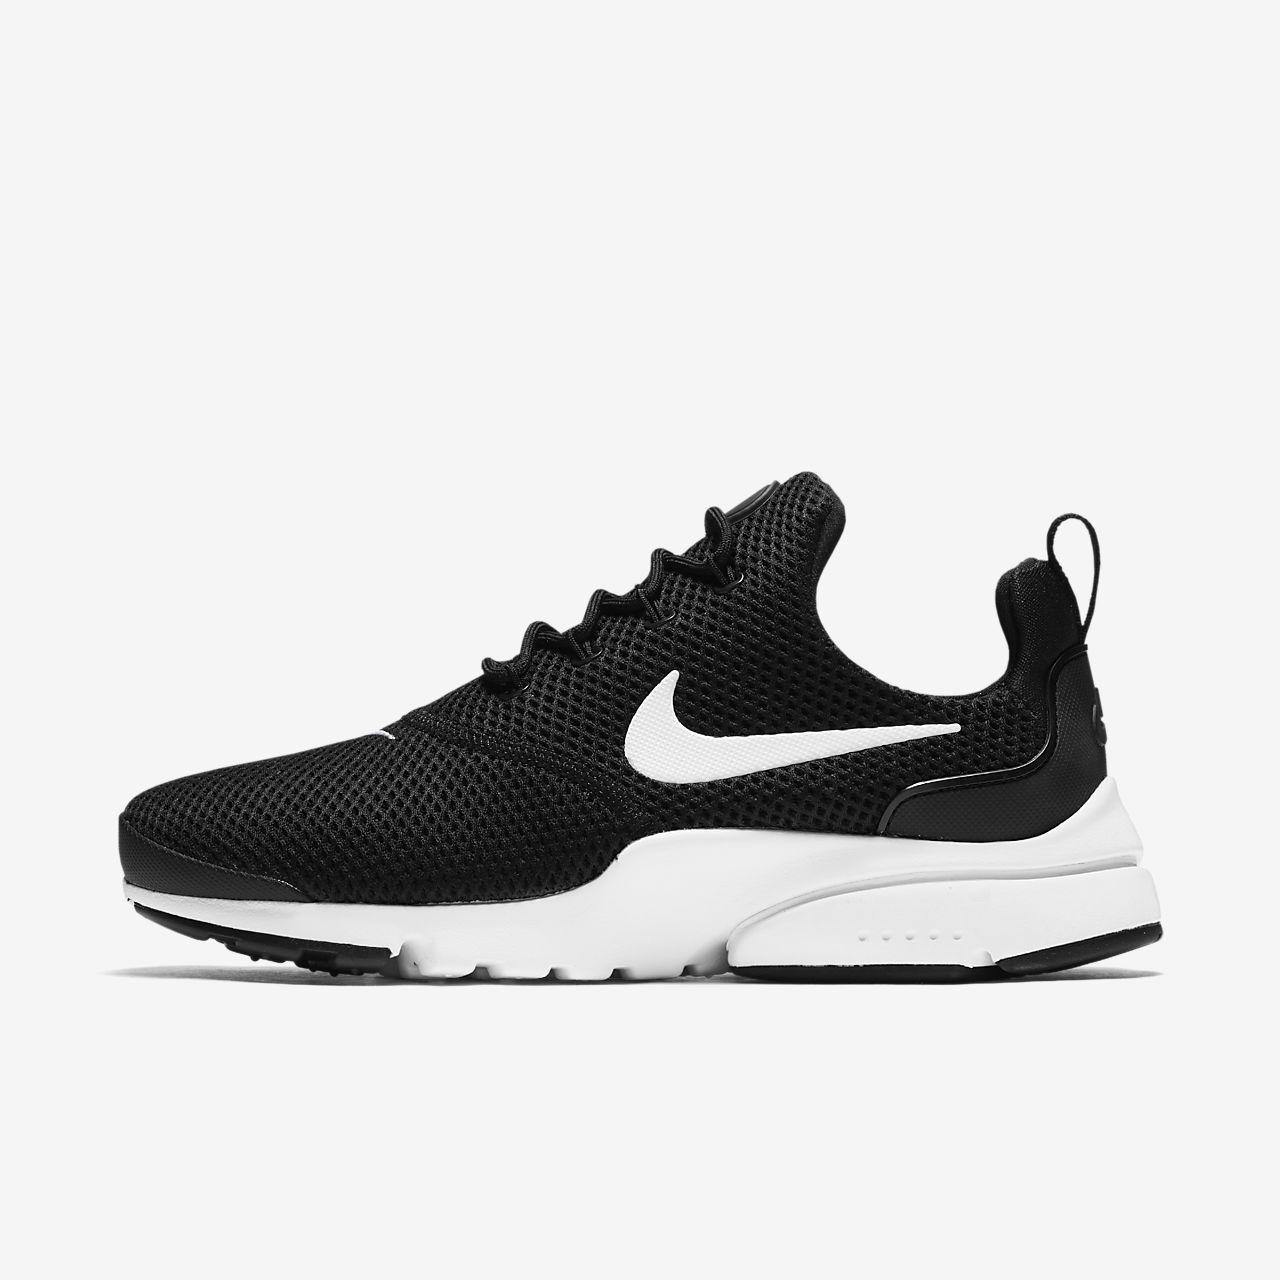 hot sale online 2881e 4ec1a ... Nike Presto Fly Zapatillas - Mujer